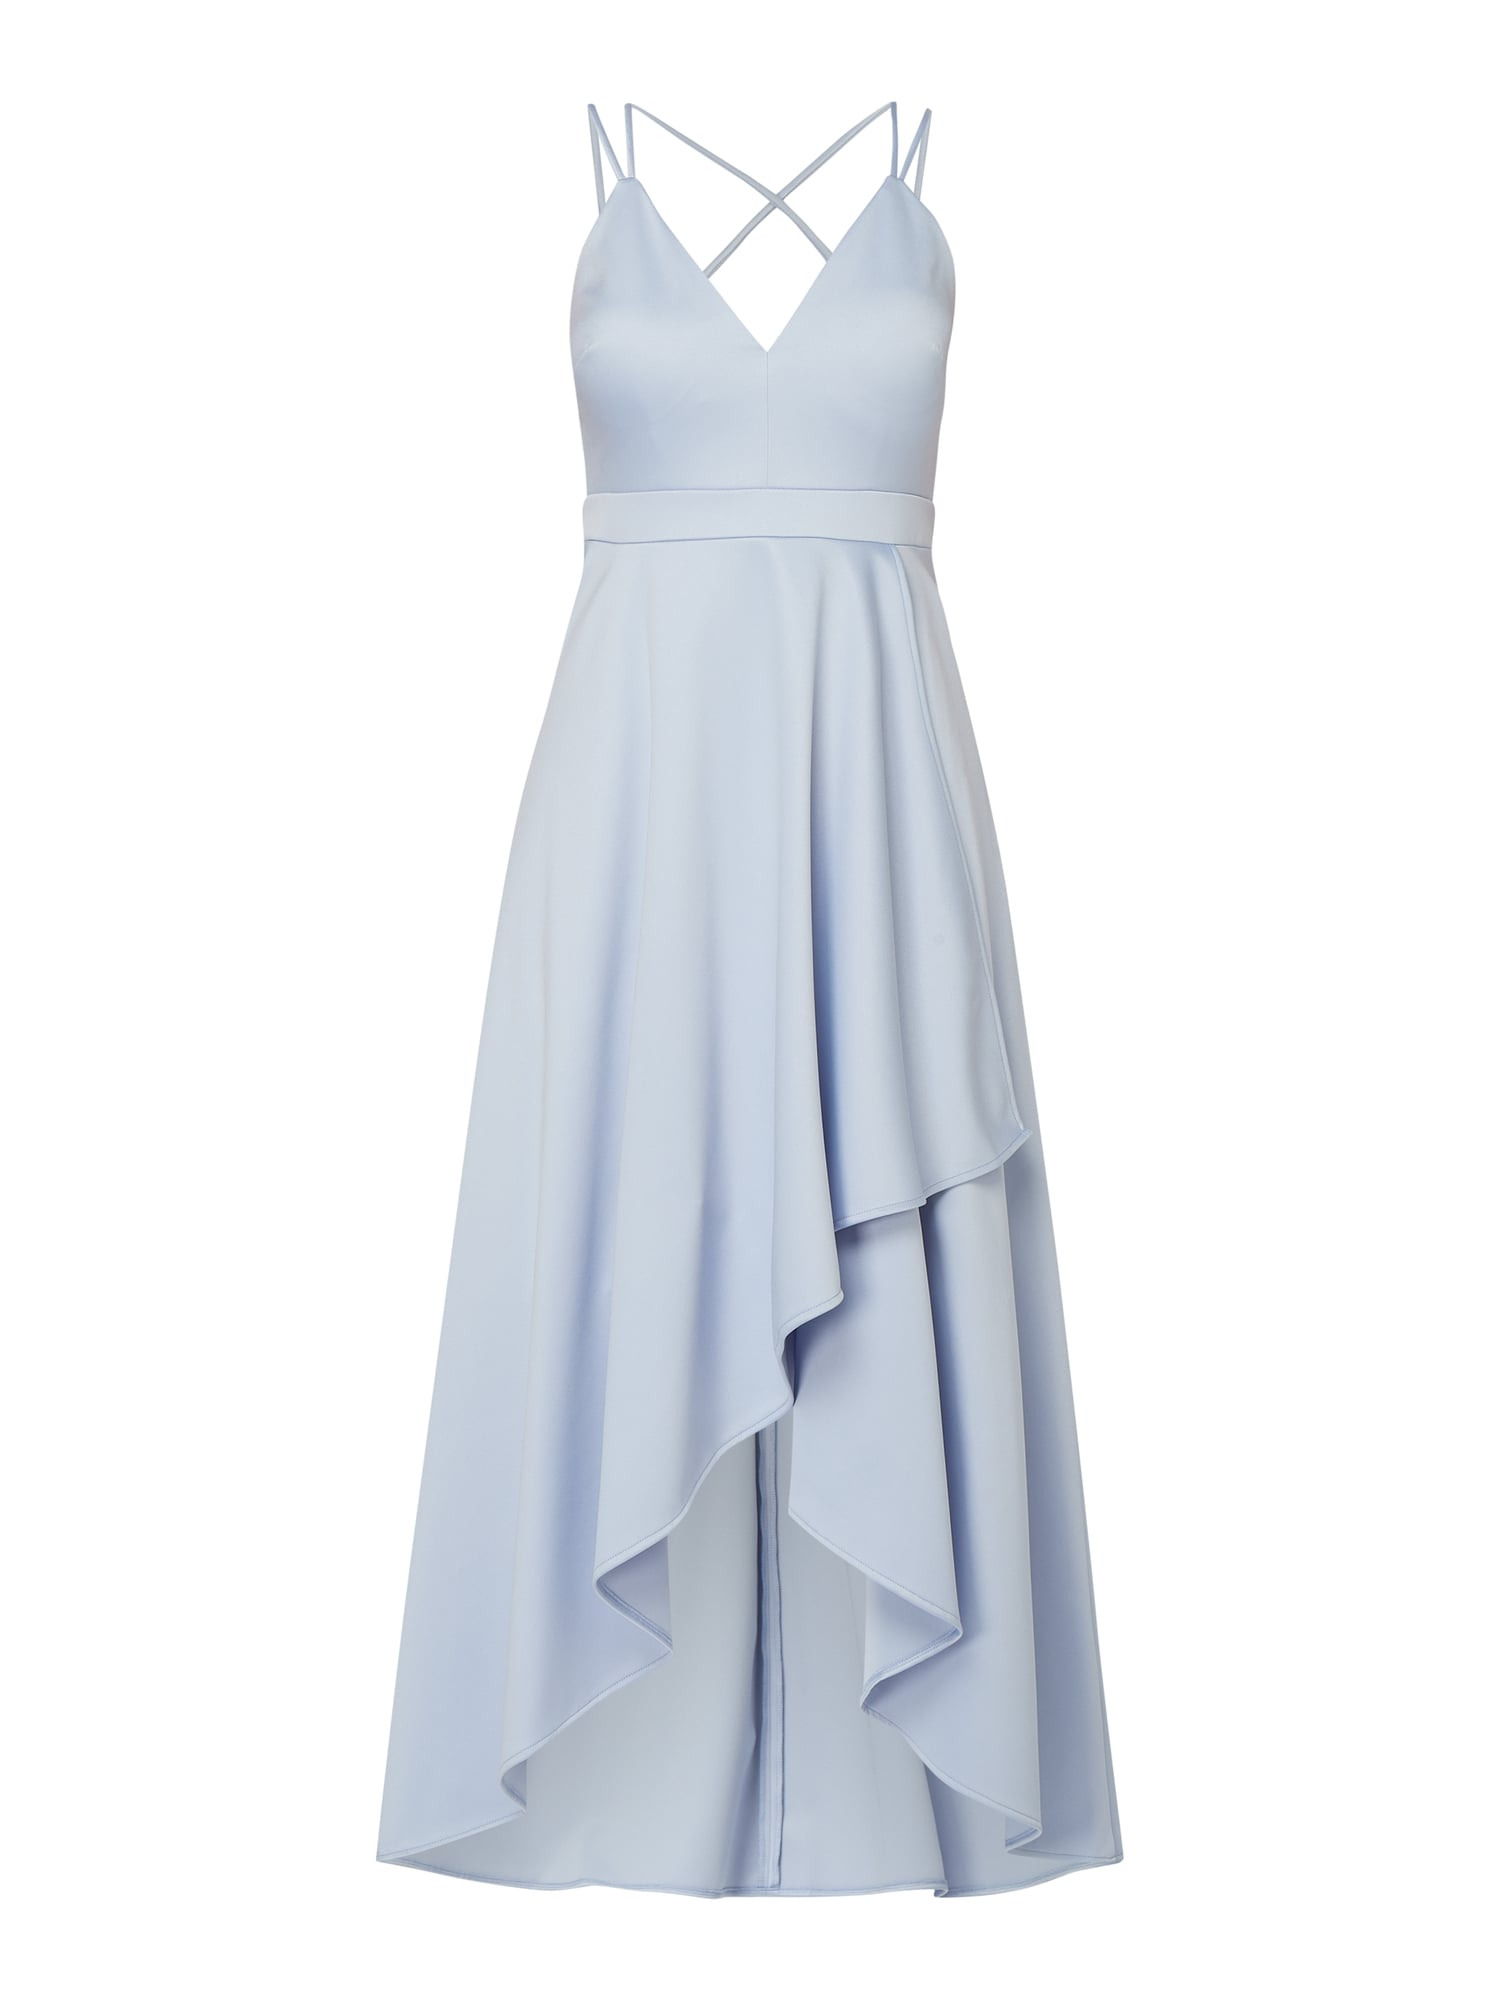 Abend Luxus Wickel Abendkleid Design17 Cool Wickel Abendkleid Ärmel